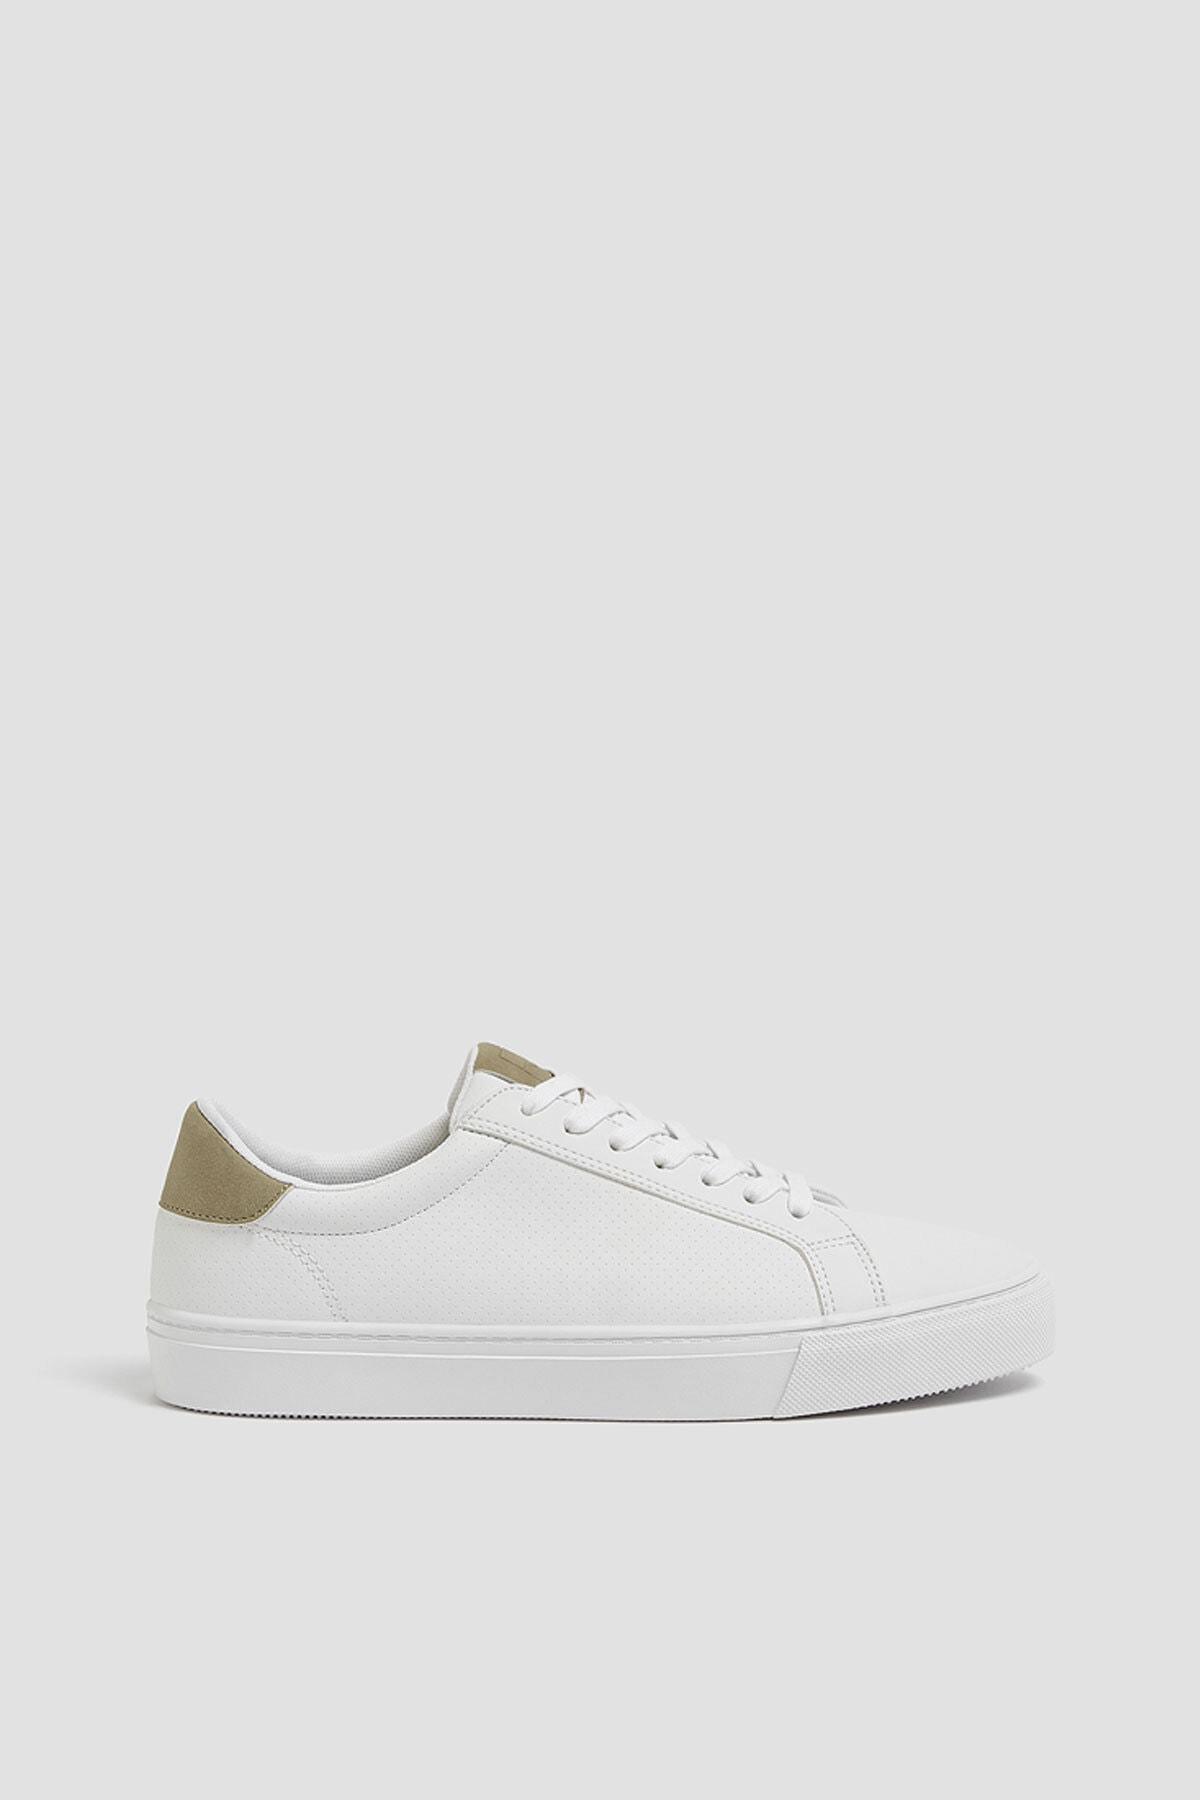 خرید پستی کفش اسپرت شیک برند Pull & Bear کد ty43332137